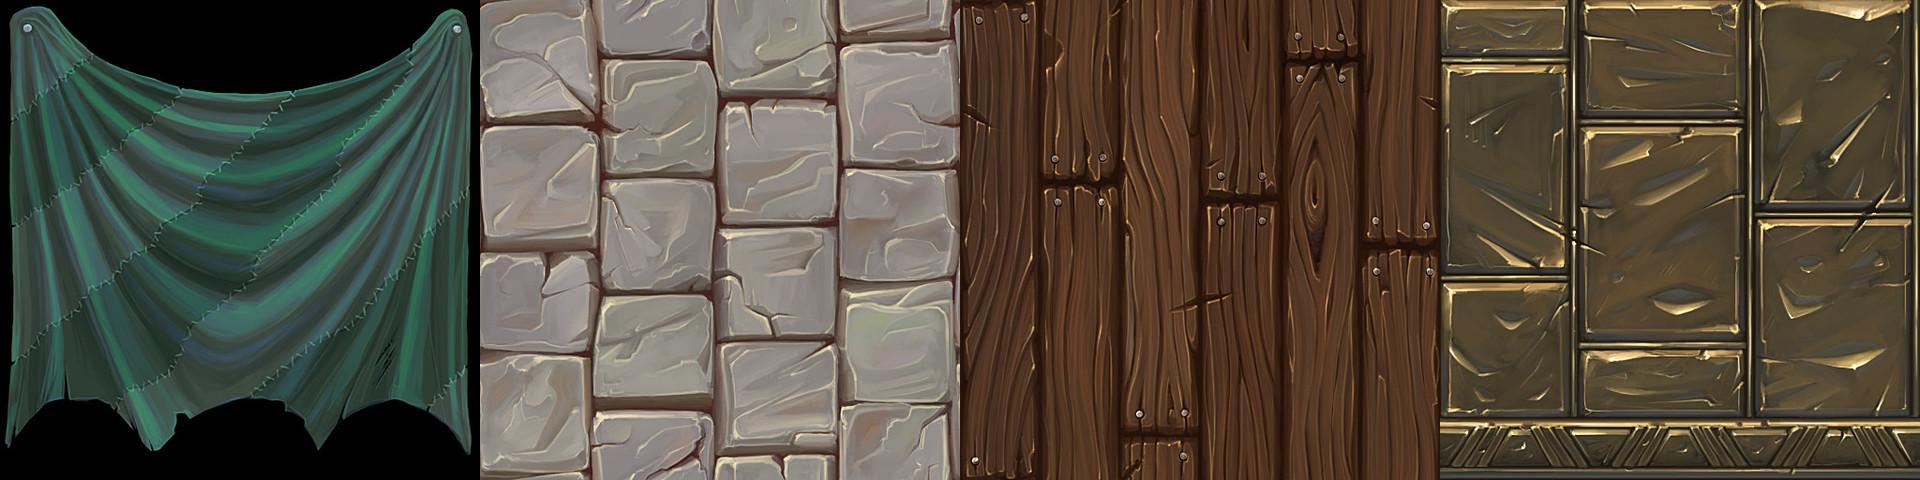 Brent ladue copernicus texture samples brent